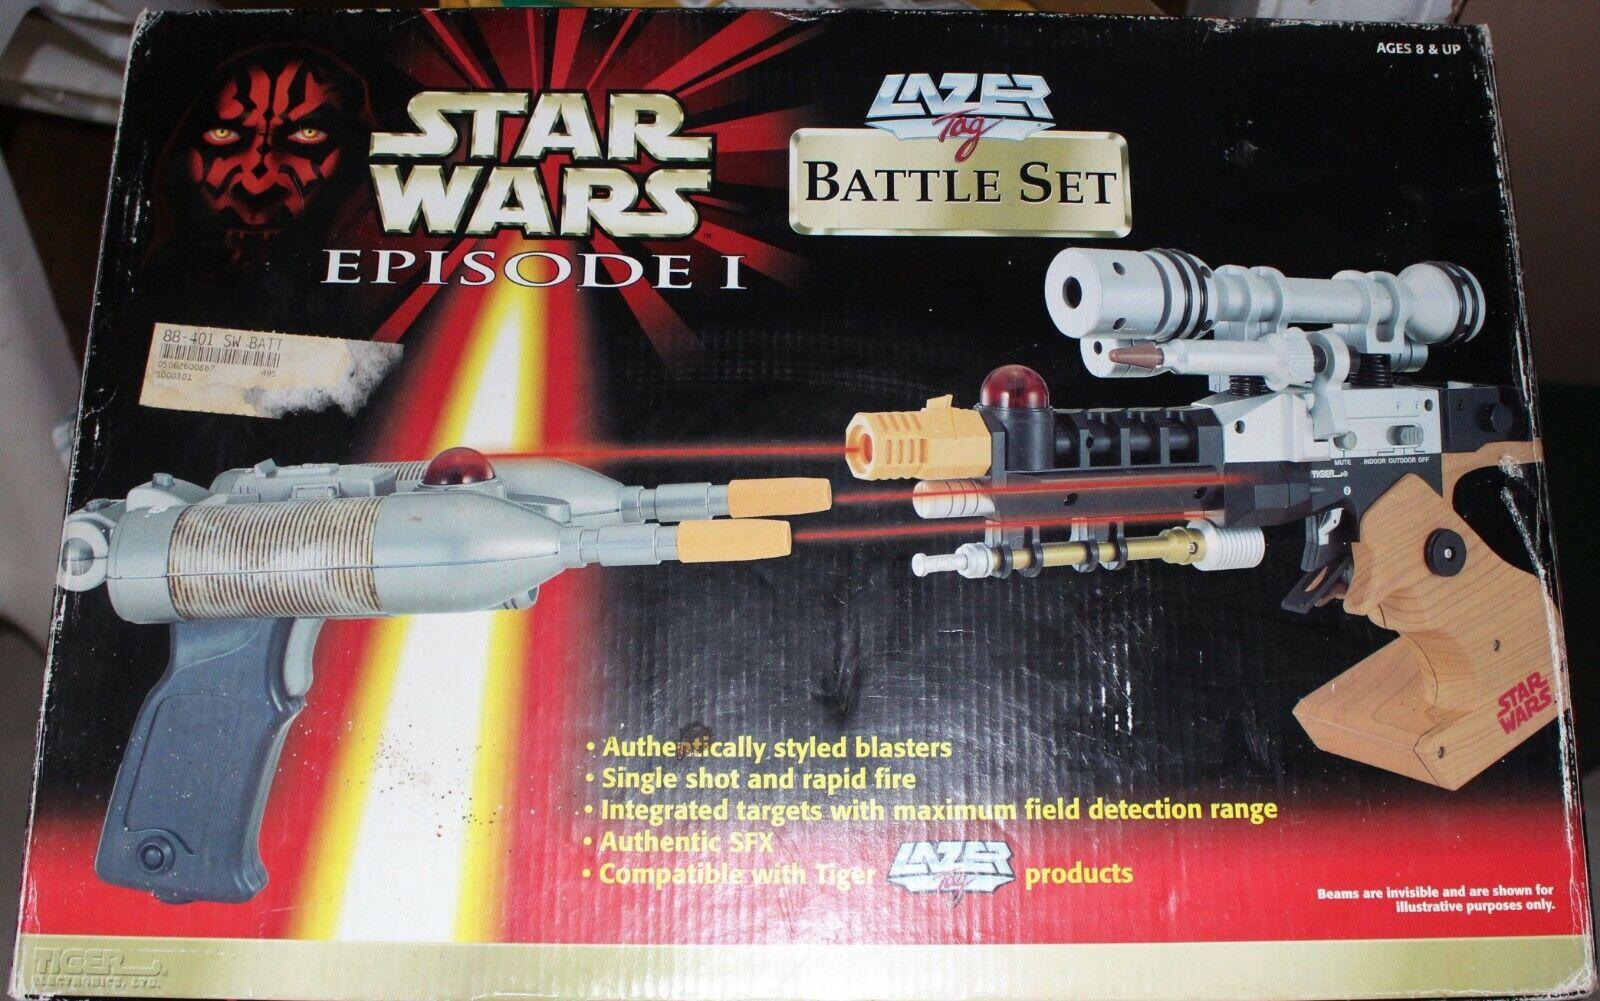 STAR WARS Episode 1 Lazer Tag Naboo Assault Set 2  Lasers 1999 Tiger Electronics  profiter de vos achats